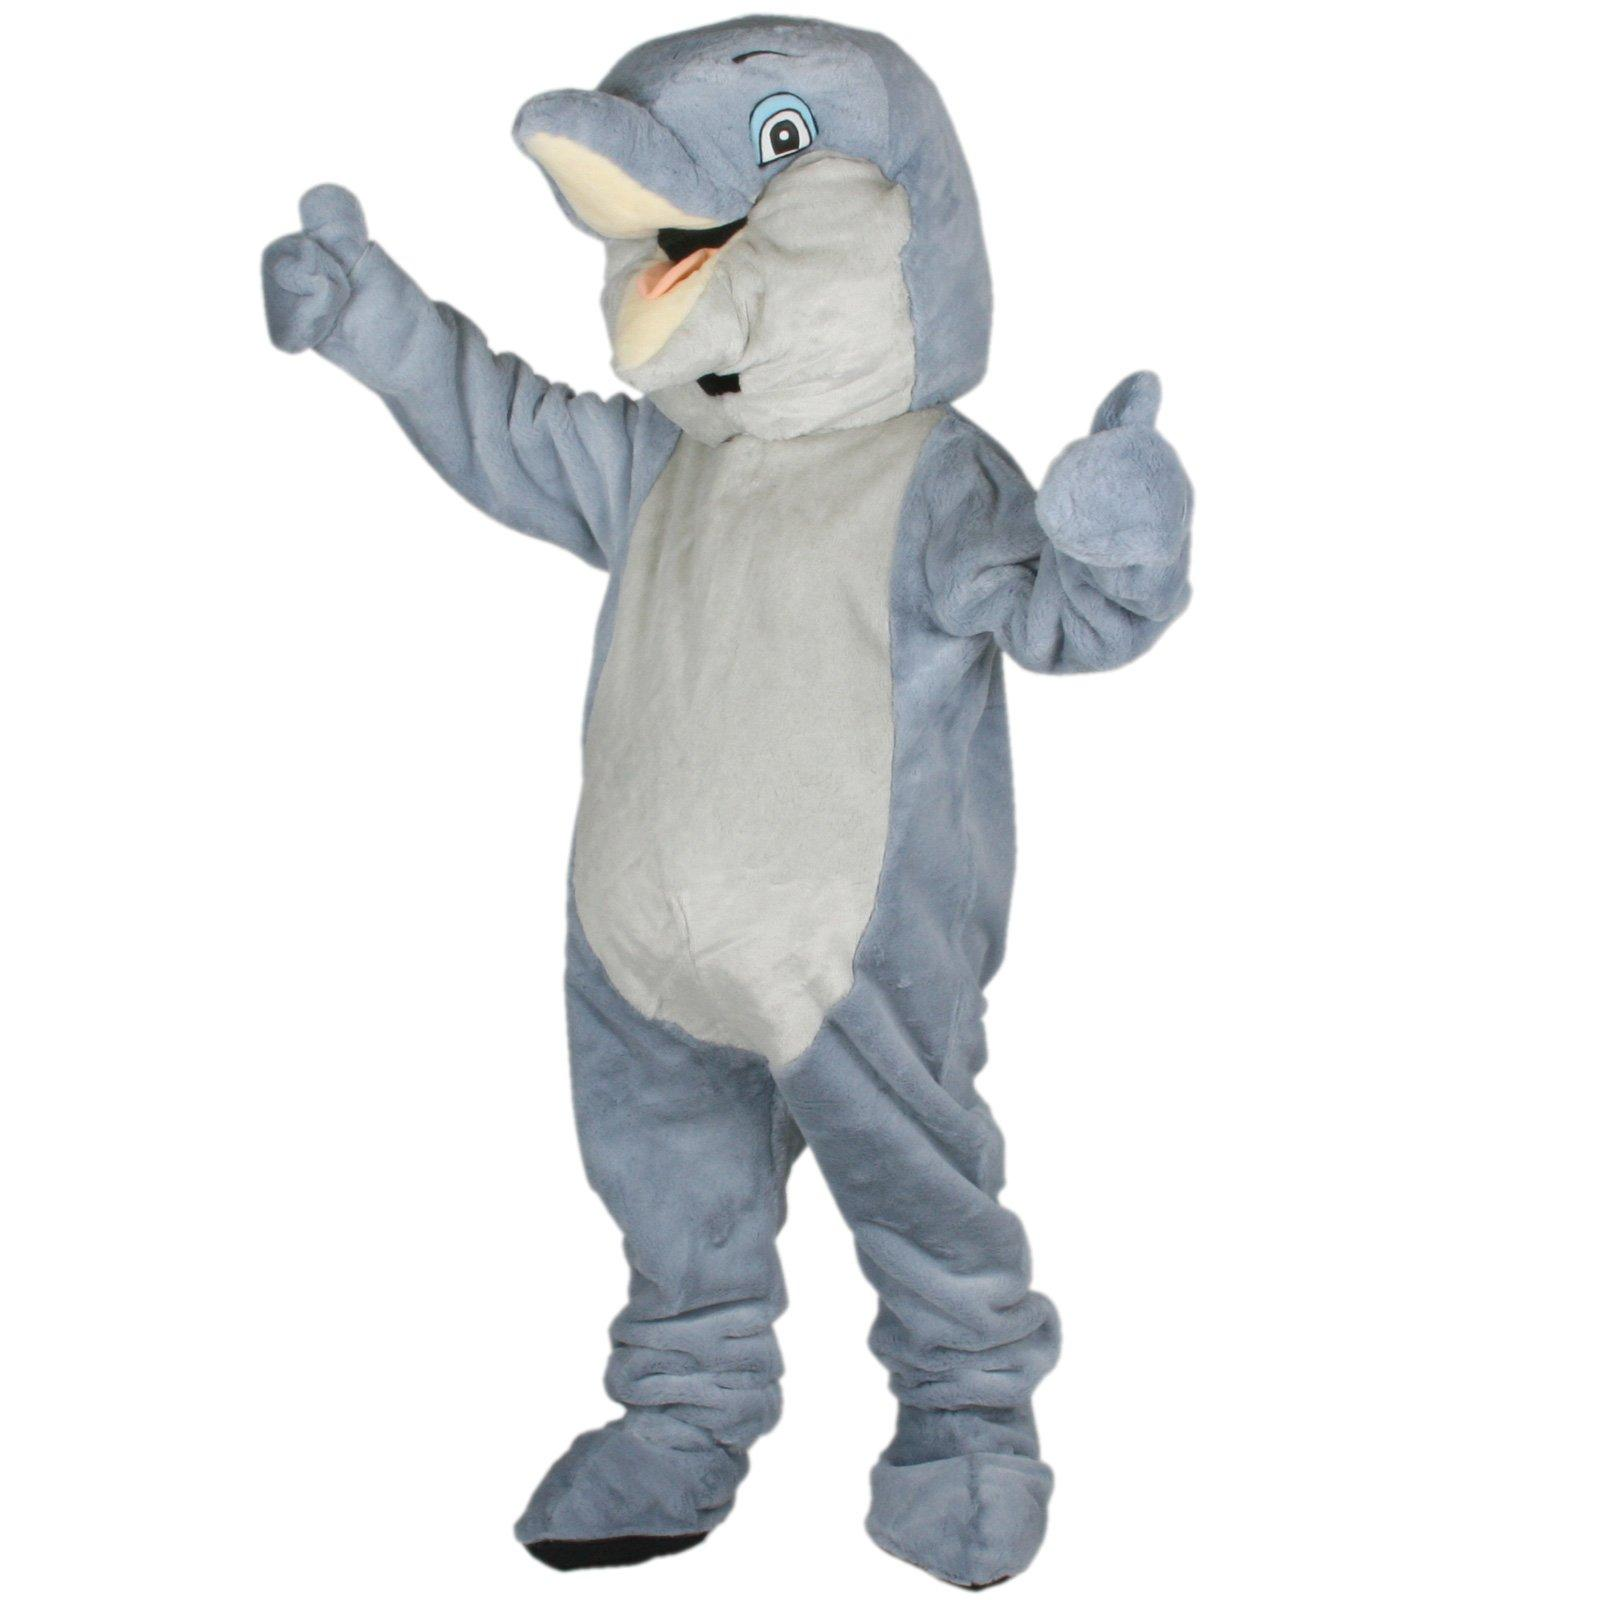 Dolphin costumes for men women kids parties costume